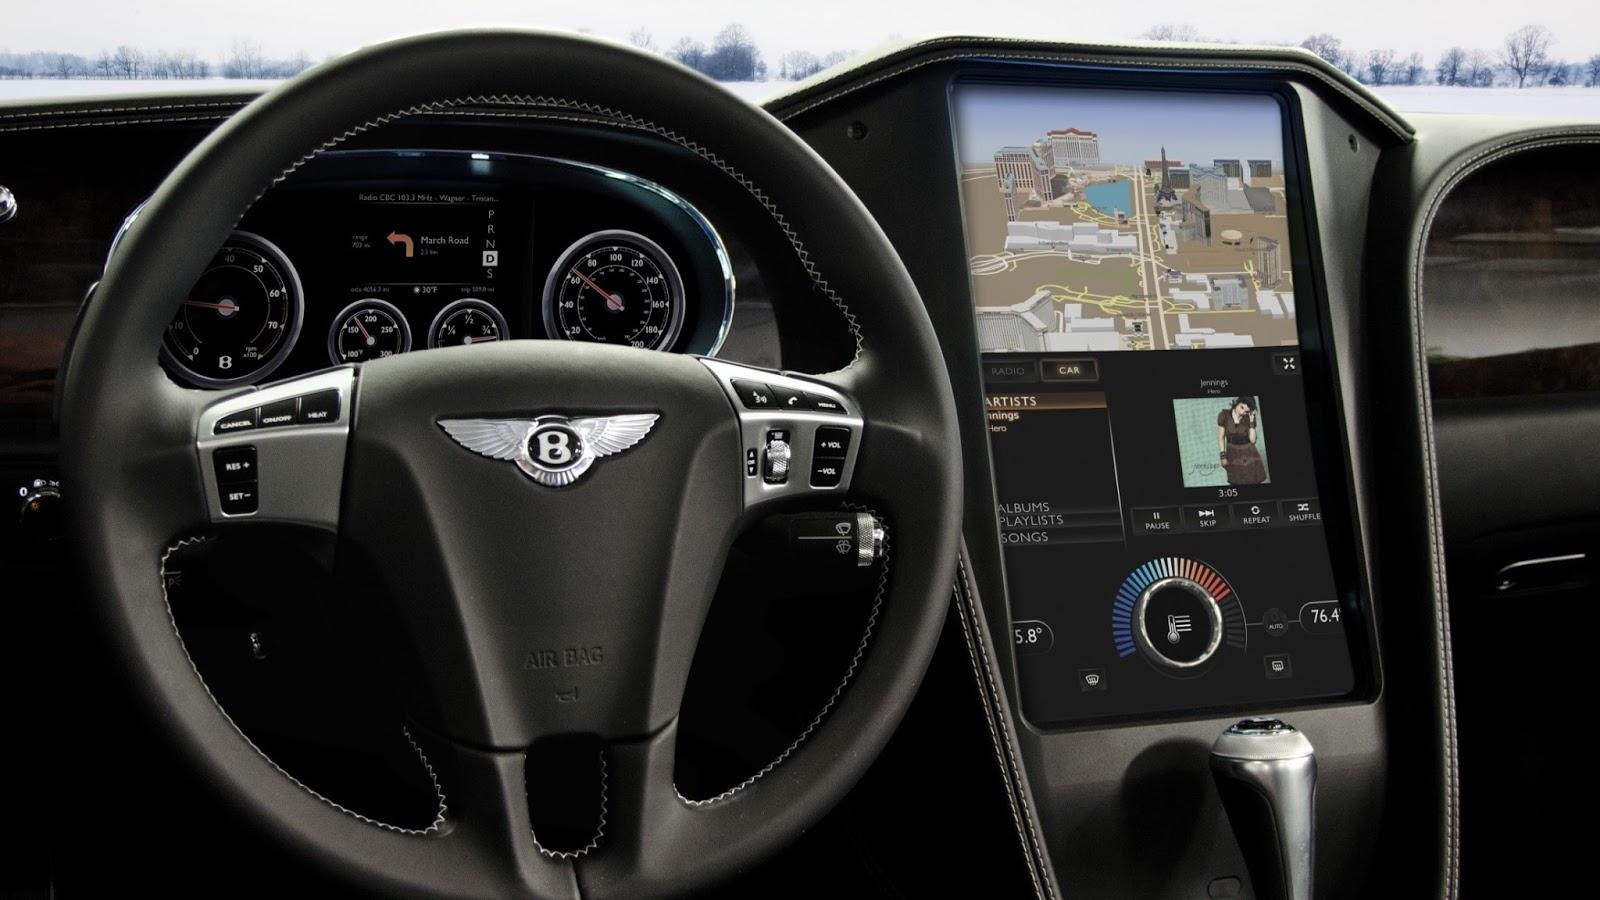 DENSO / BlackBerry HMI cockpit